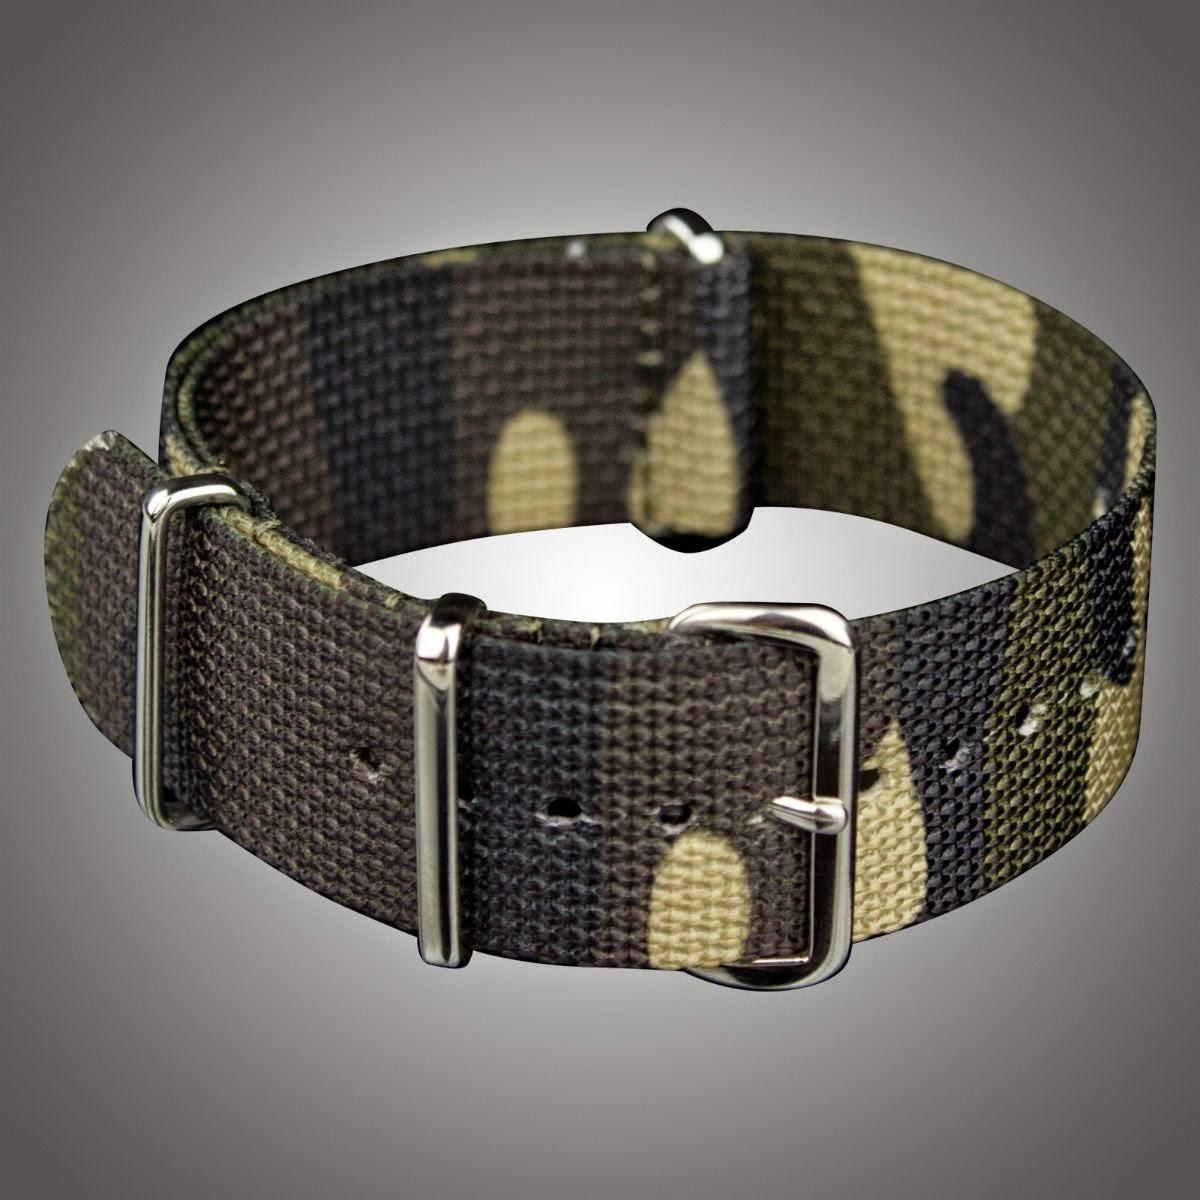 Heavy Duty 22mm Wood Land Nylon Soft Zulu Watch Band Strap +Silver Ring Buckle